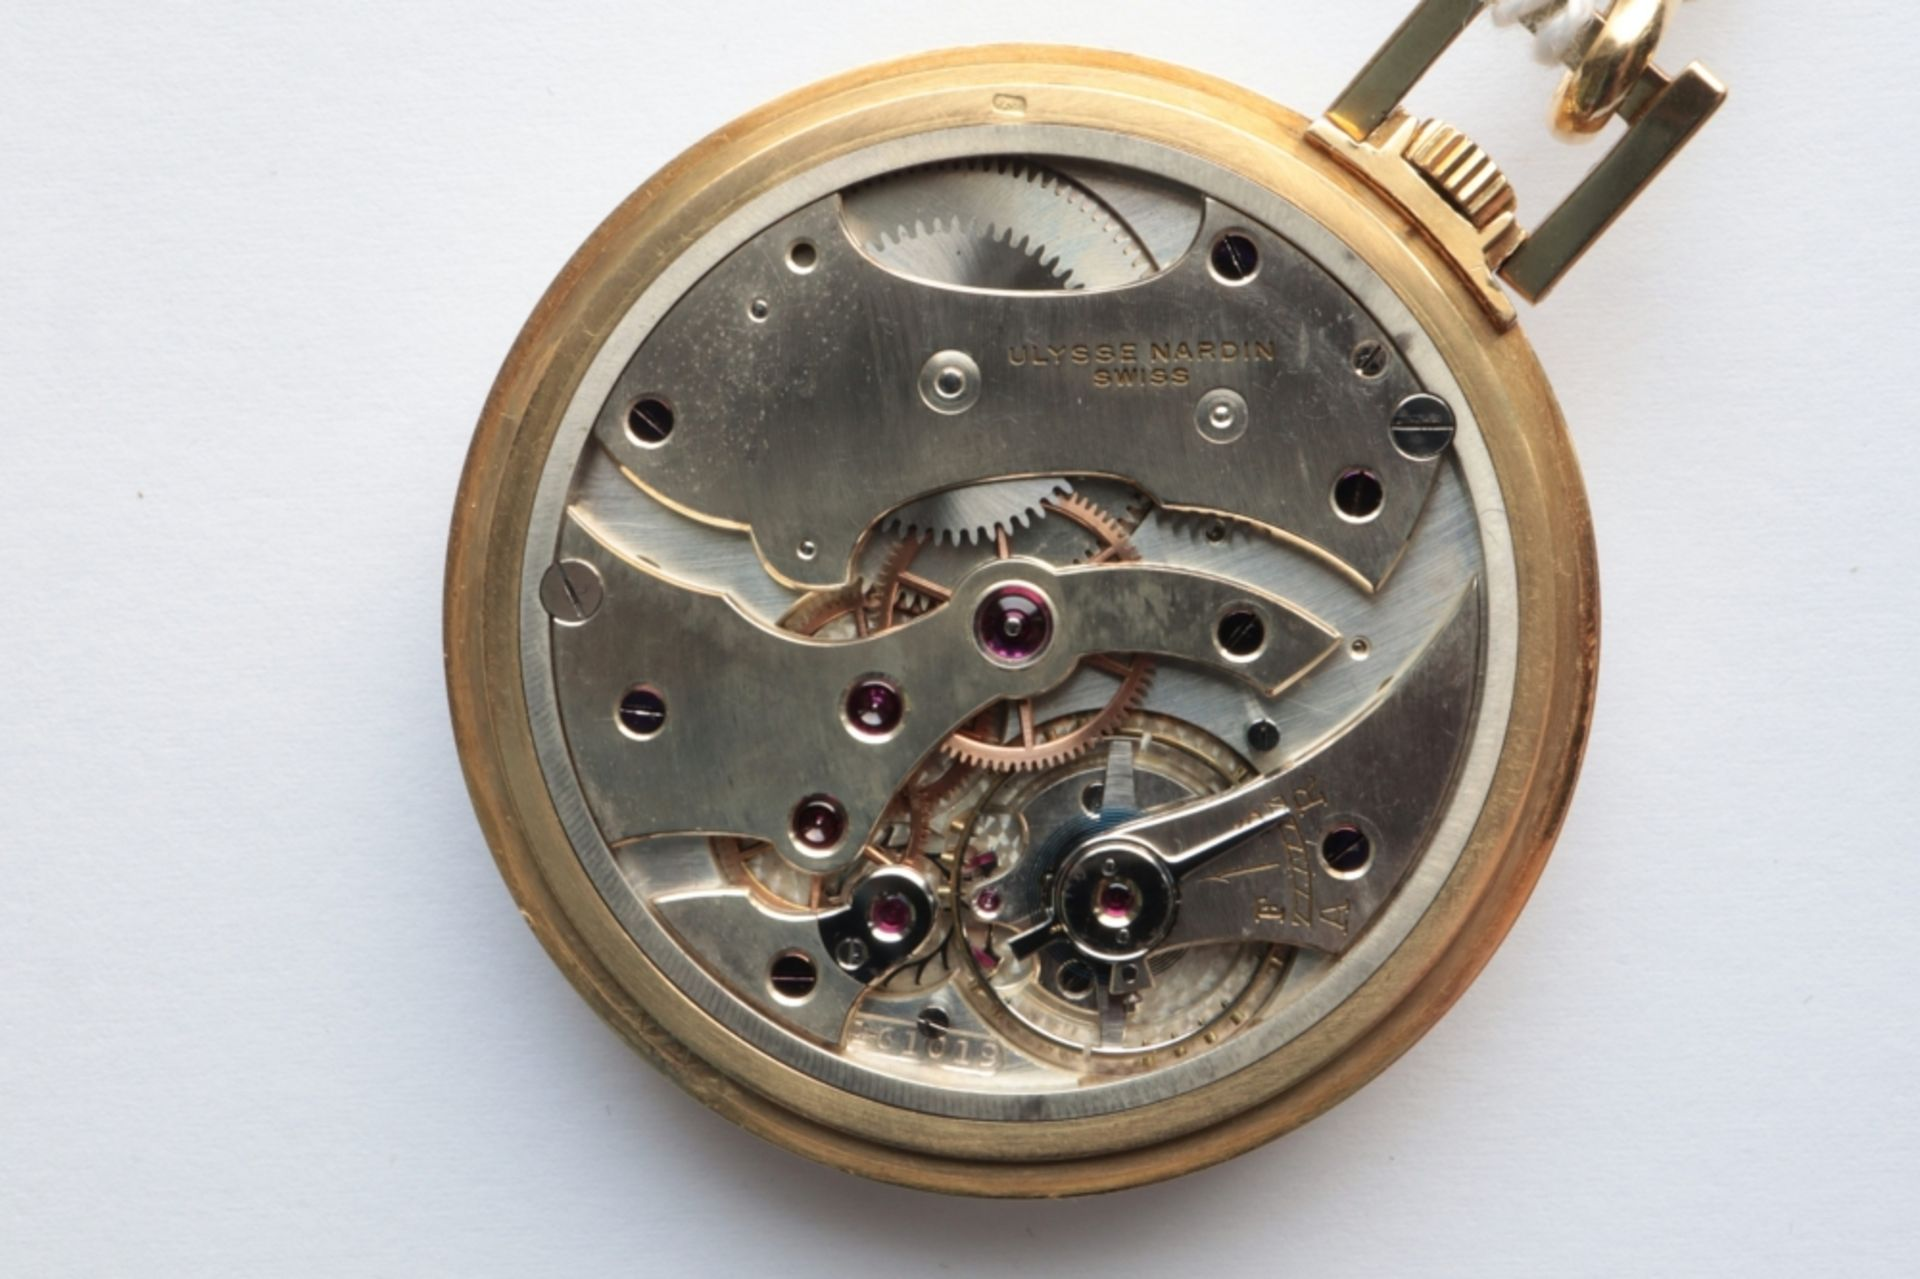 Ulysse Nardin Ulysse Nardin chronometer watch SWITZERLAND 18k gold Ulysse Nardin pocket watch. - Image 3 of 3